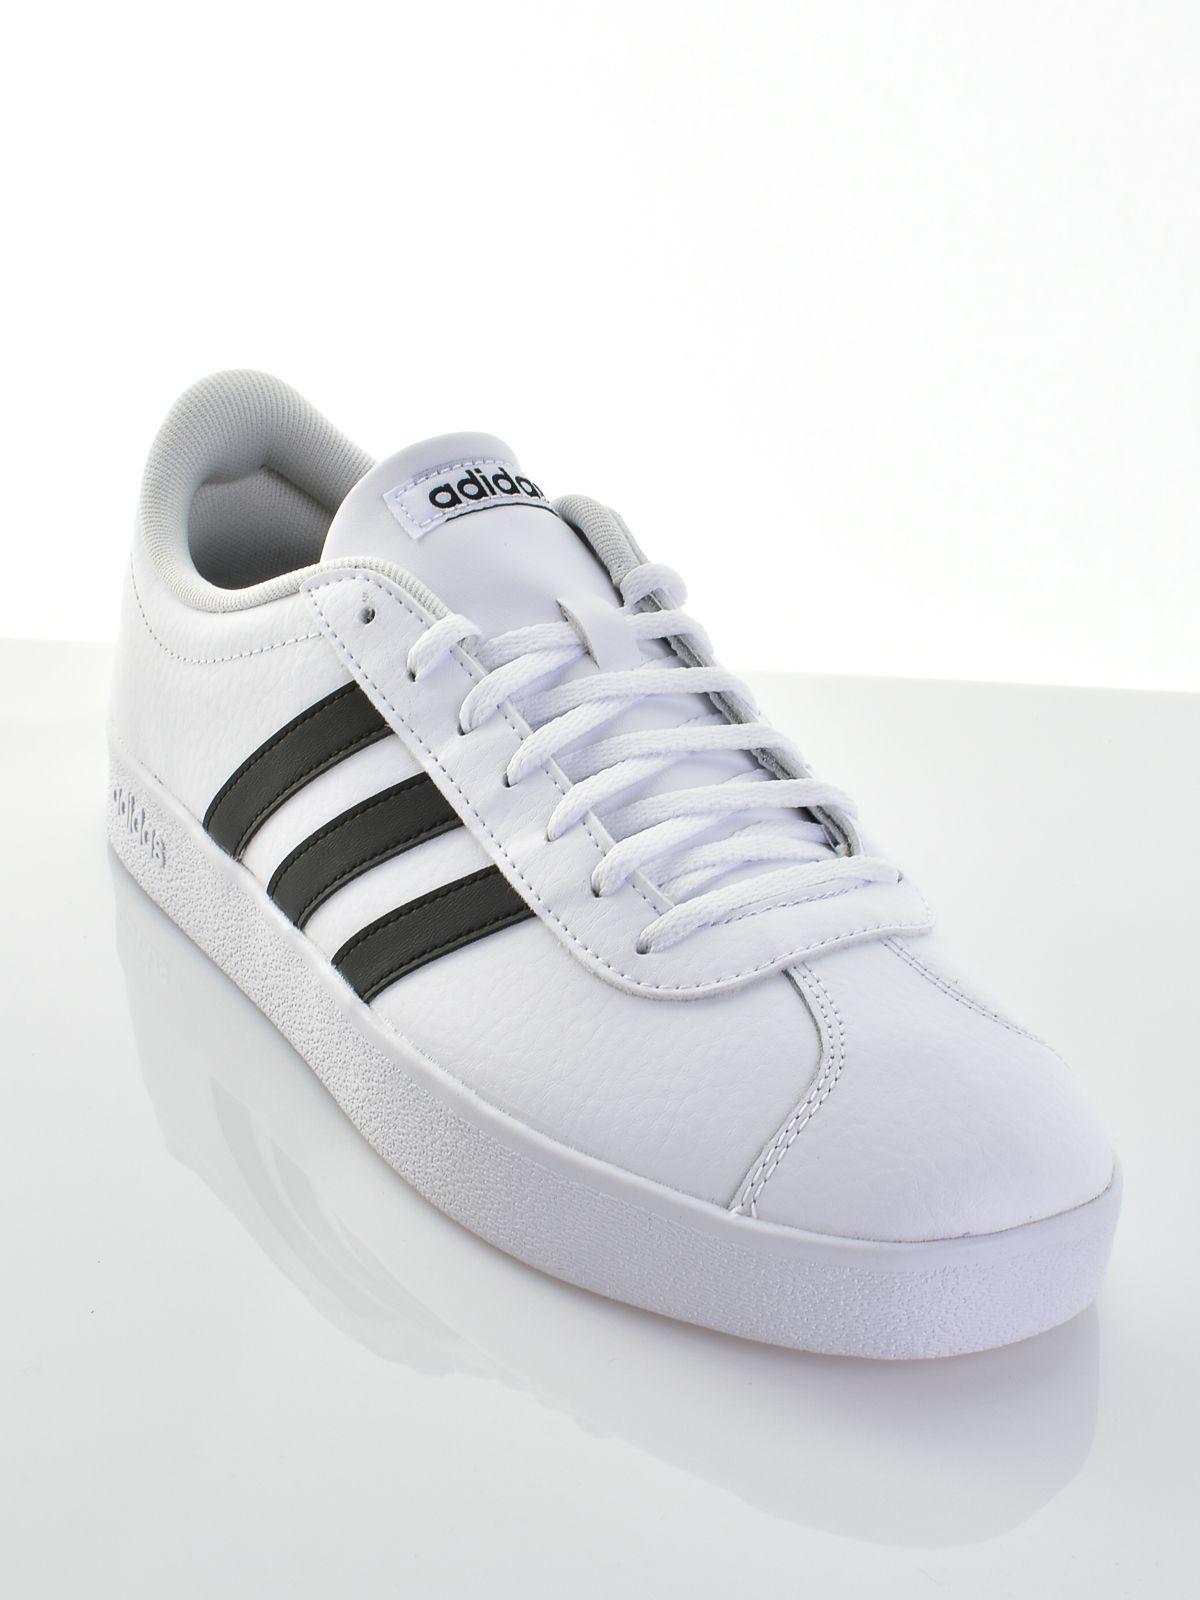 ... Adidas férfi cipő VL COURT 2.0 ... 6b321bc212